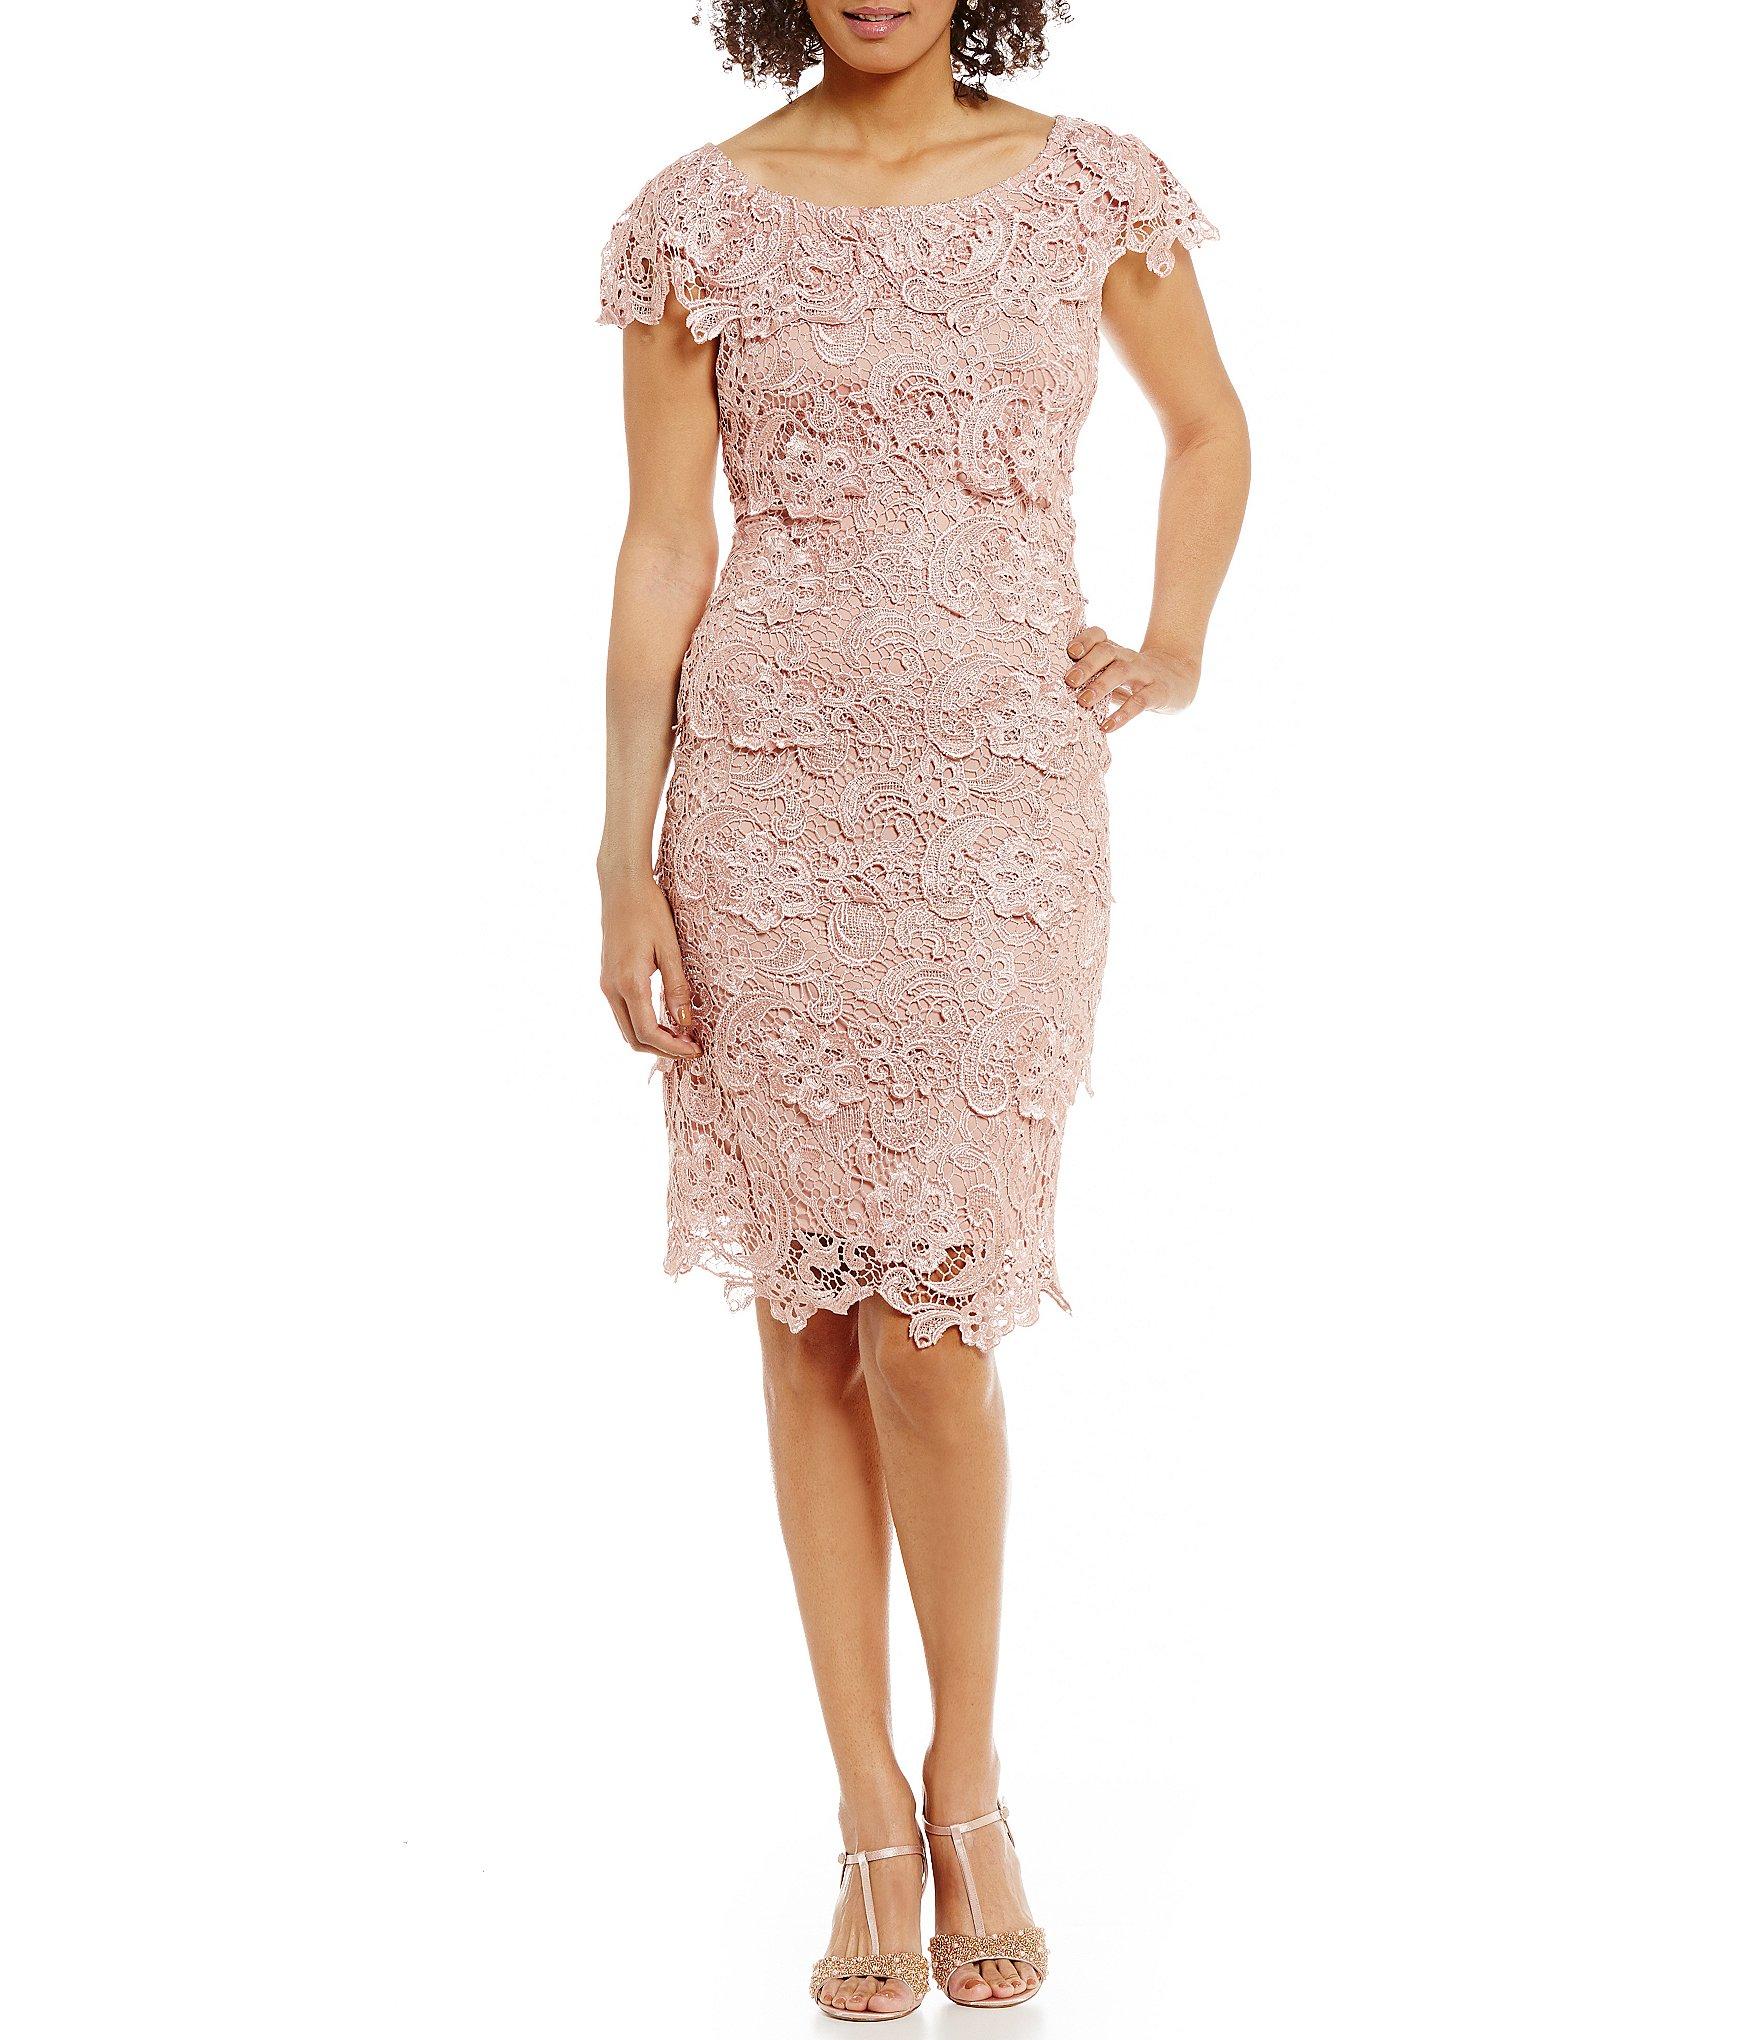 Women\'s Clothing   Dresses   Dillards.com